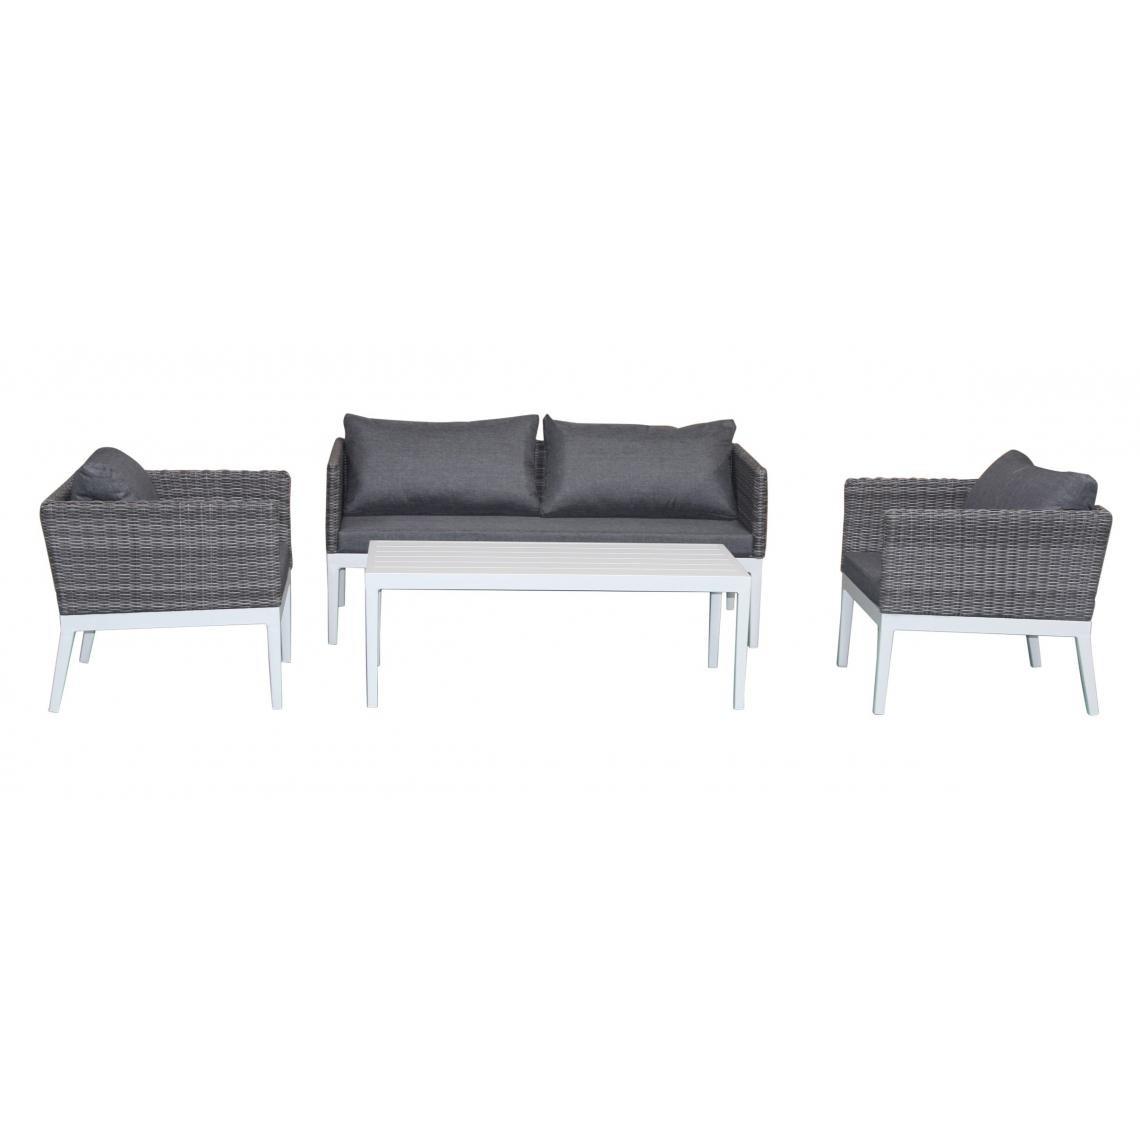 Salon de Jardin en Aluminium Et Résine Tressée Gris LOLA | 3 ...